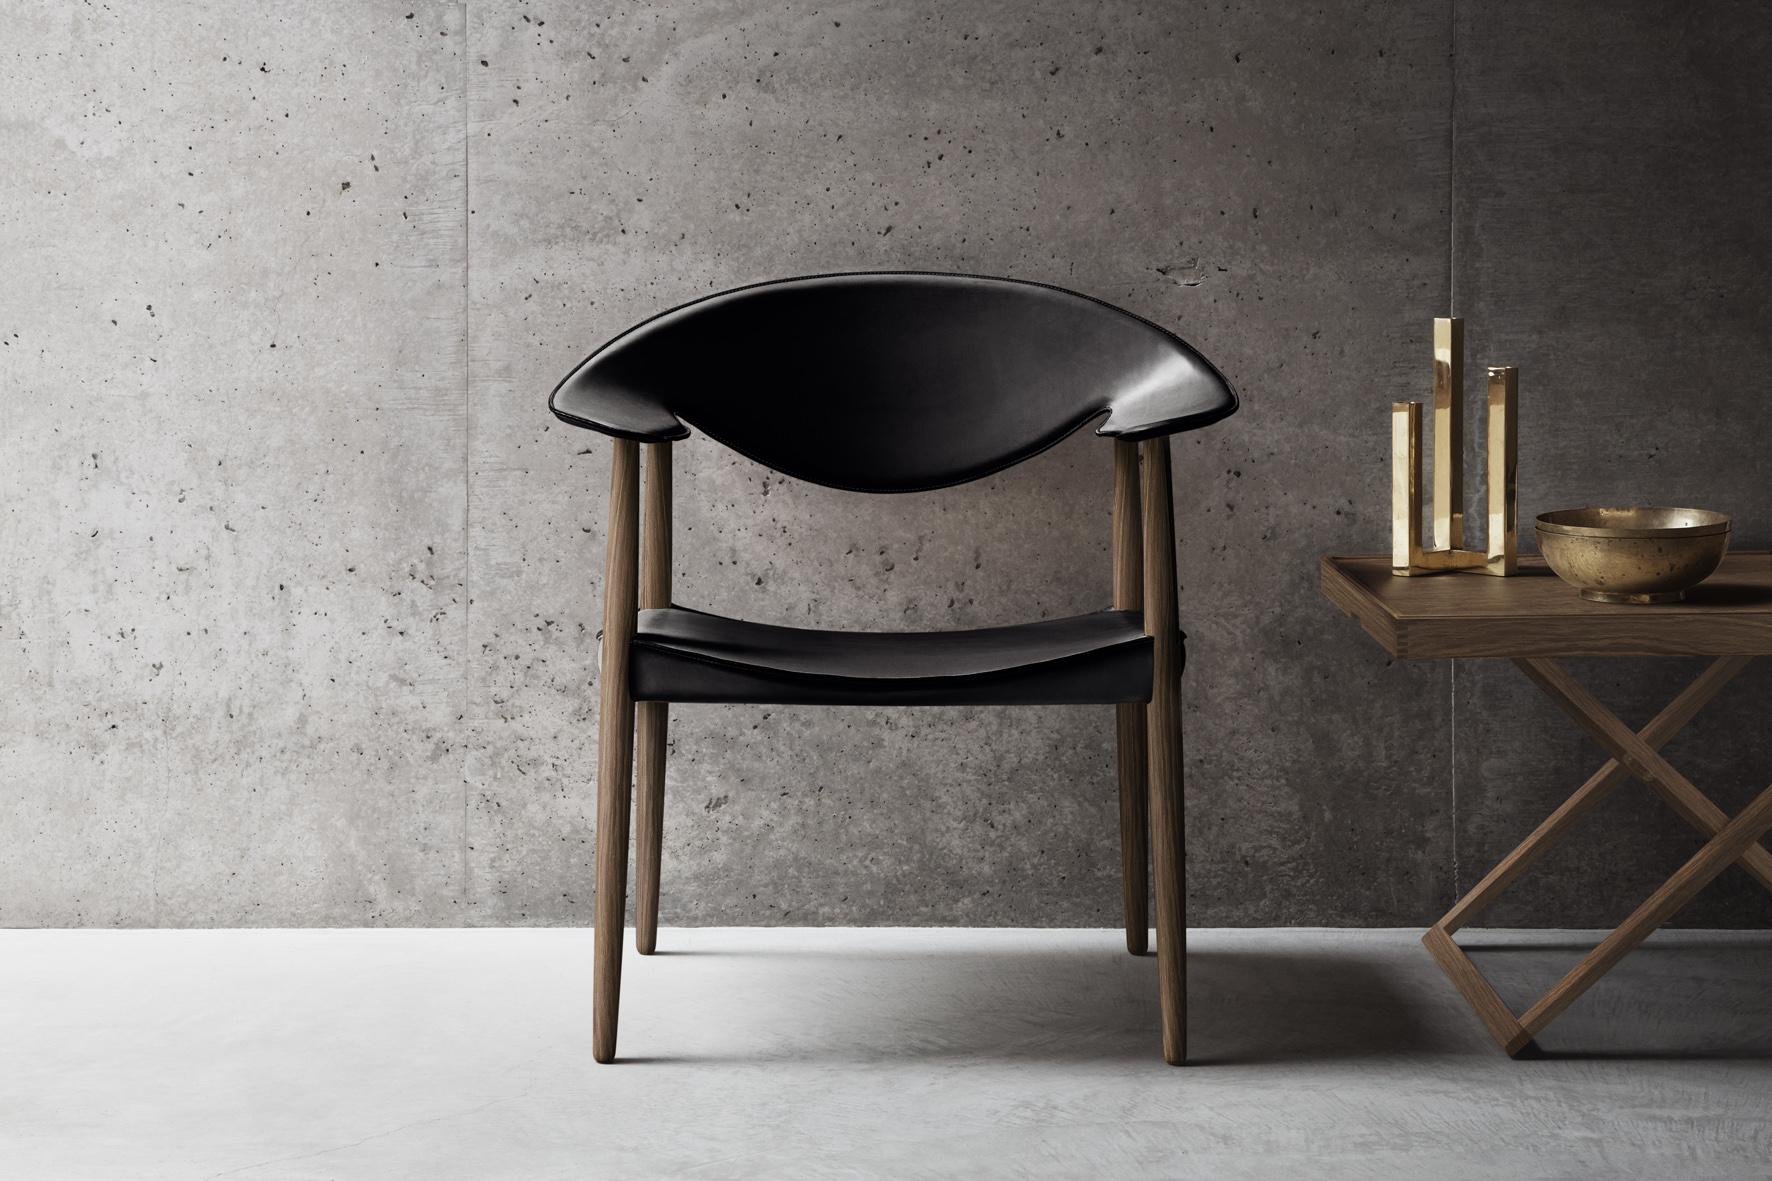 Ejner Larsen and Aksel Bender Madsen's 'Metropolitan' chair from 1949, now reissued by Carl Hansen & Son.